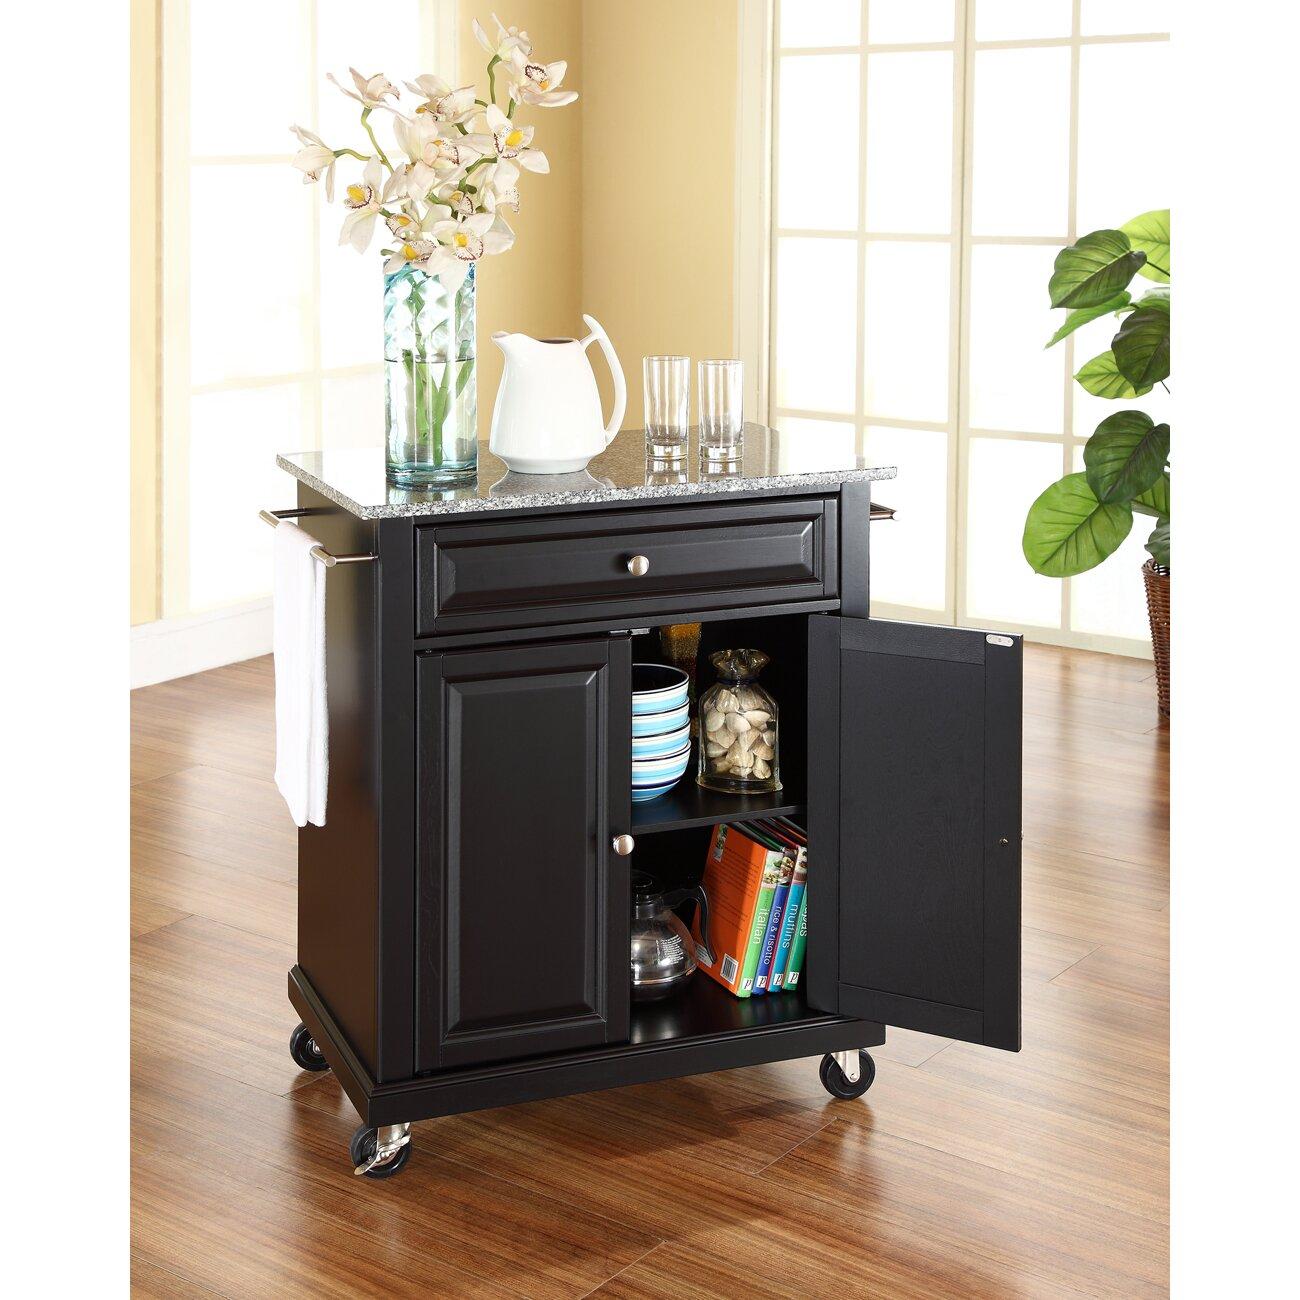 darby home co detweiler solid granite top portable kitchen cart island reviews wayfair. Black Bedroom Furniture Sets. Home Design Ideas